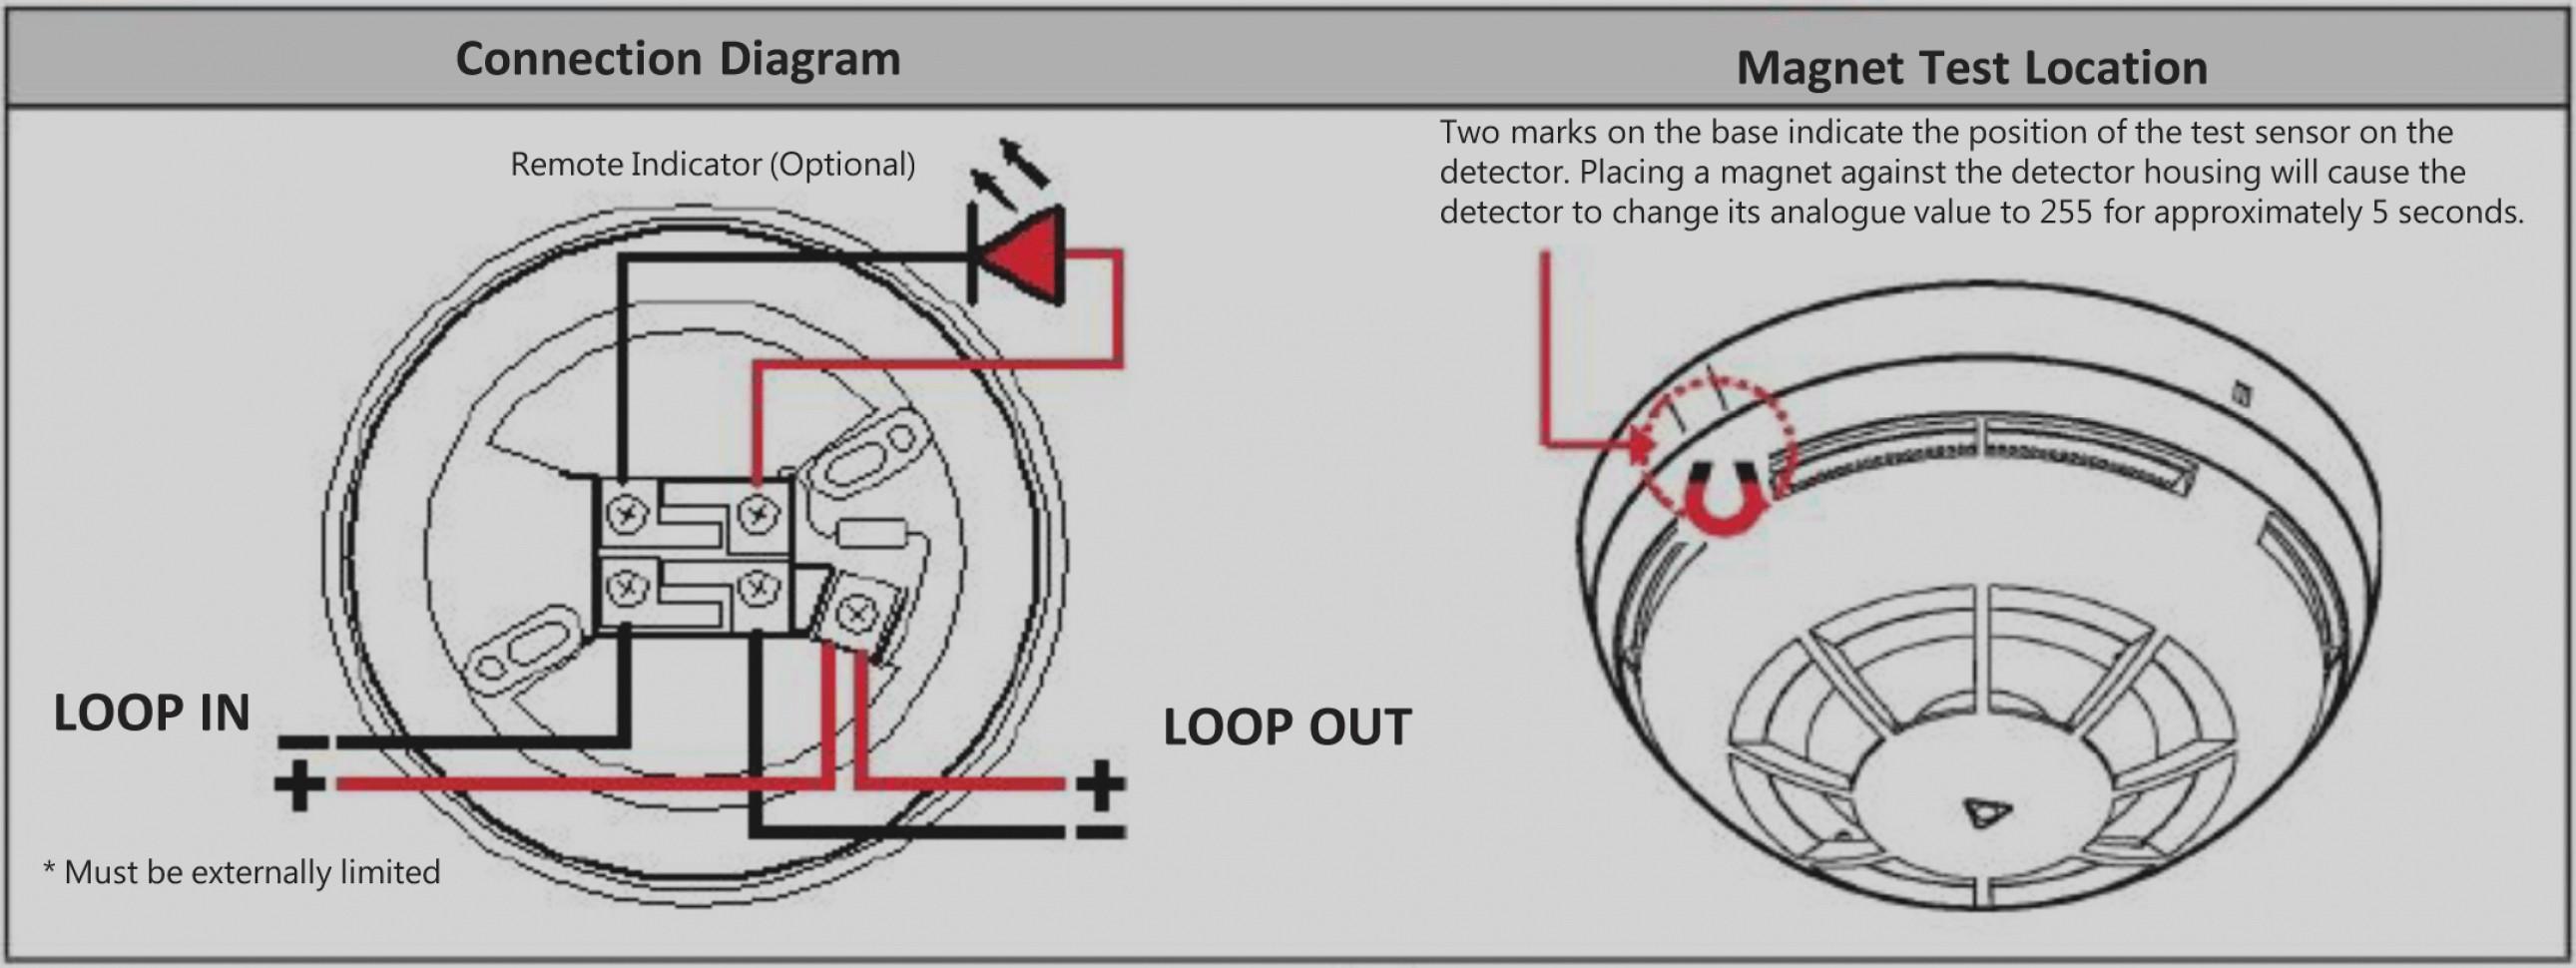 Kidde fire alarm and carbon monoxide detector manual